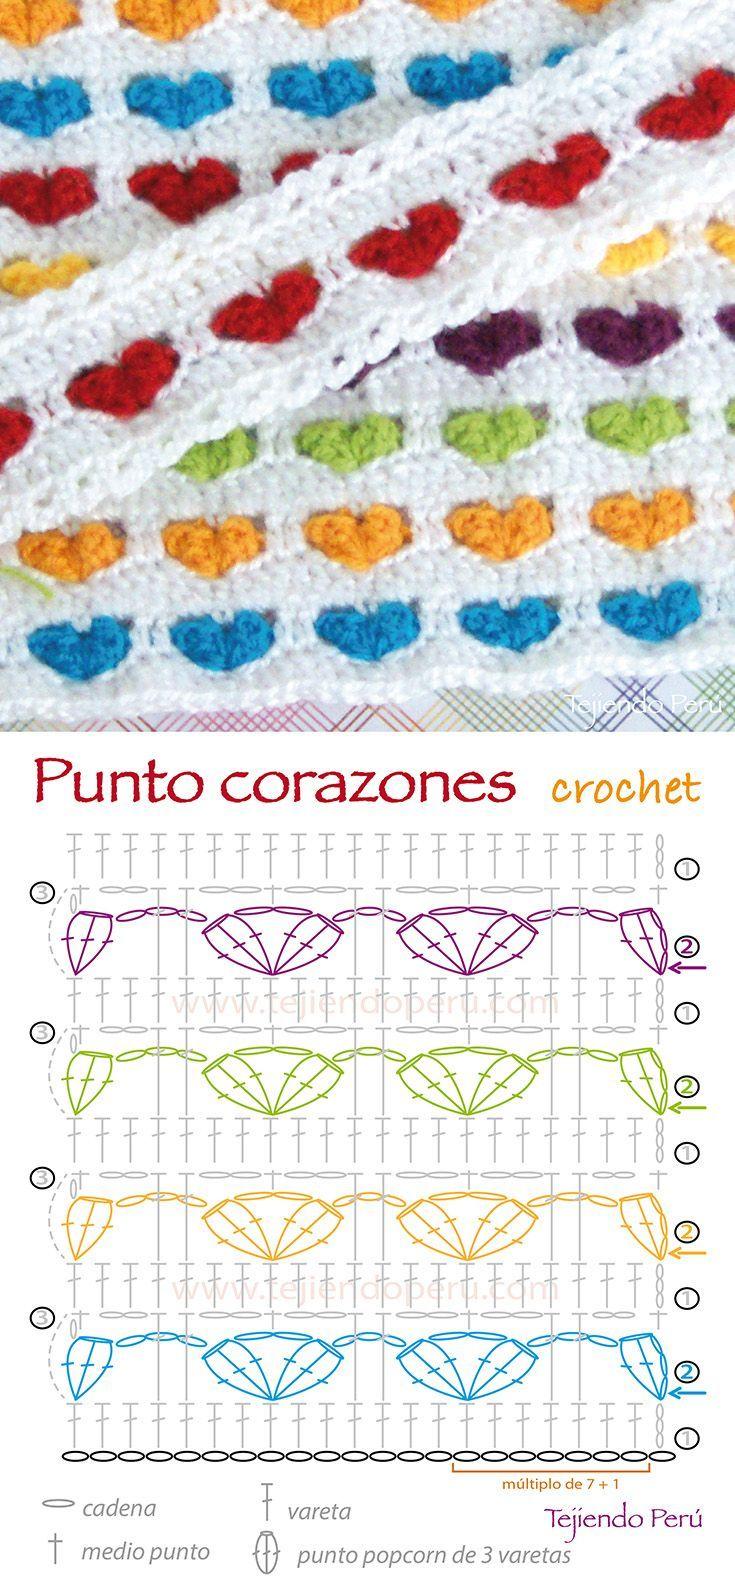 Heart Stitch - Free Crochet Diagram - See https://www.youtube.com/watch?v=sQizVaUyAGQ For Accompanying Spanish Video Tutorial - (youtube):